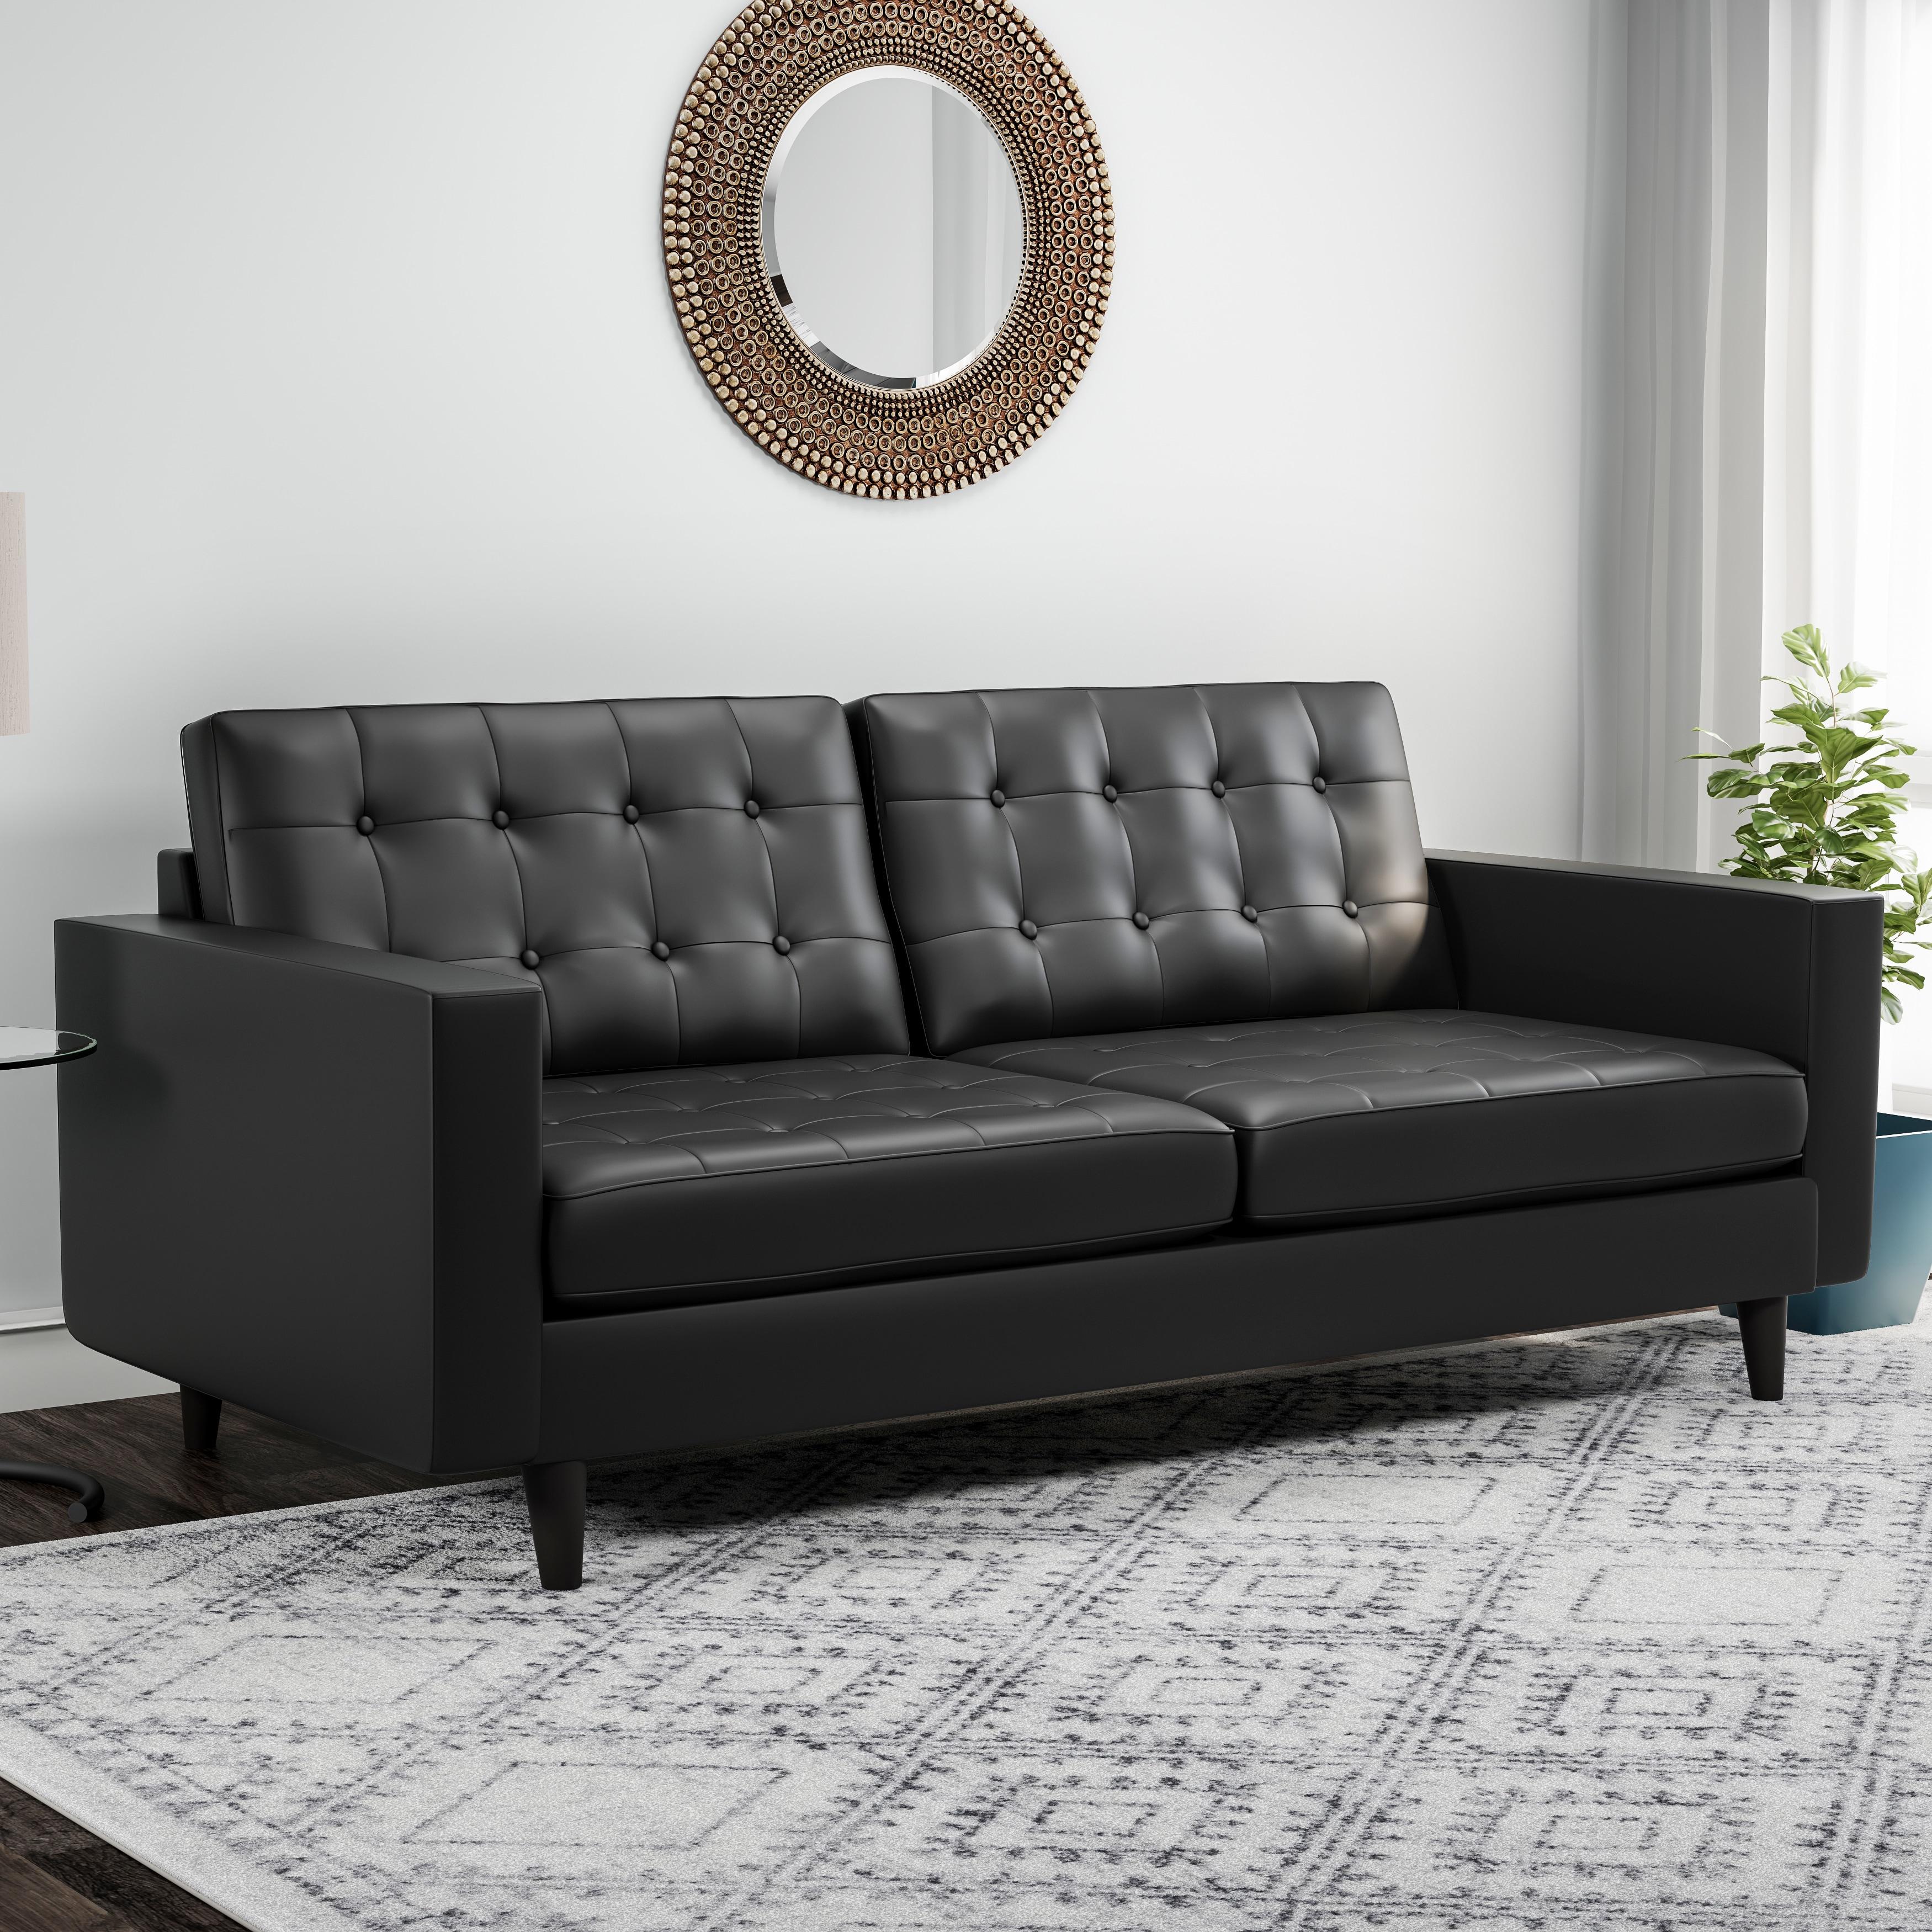 Carson Carrington Eggedal Tufted Bonded Leather Sofa Free Shipping Today 19473321